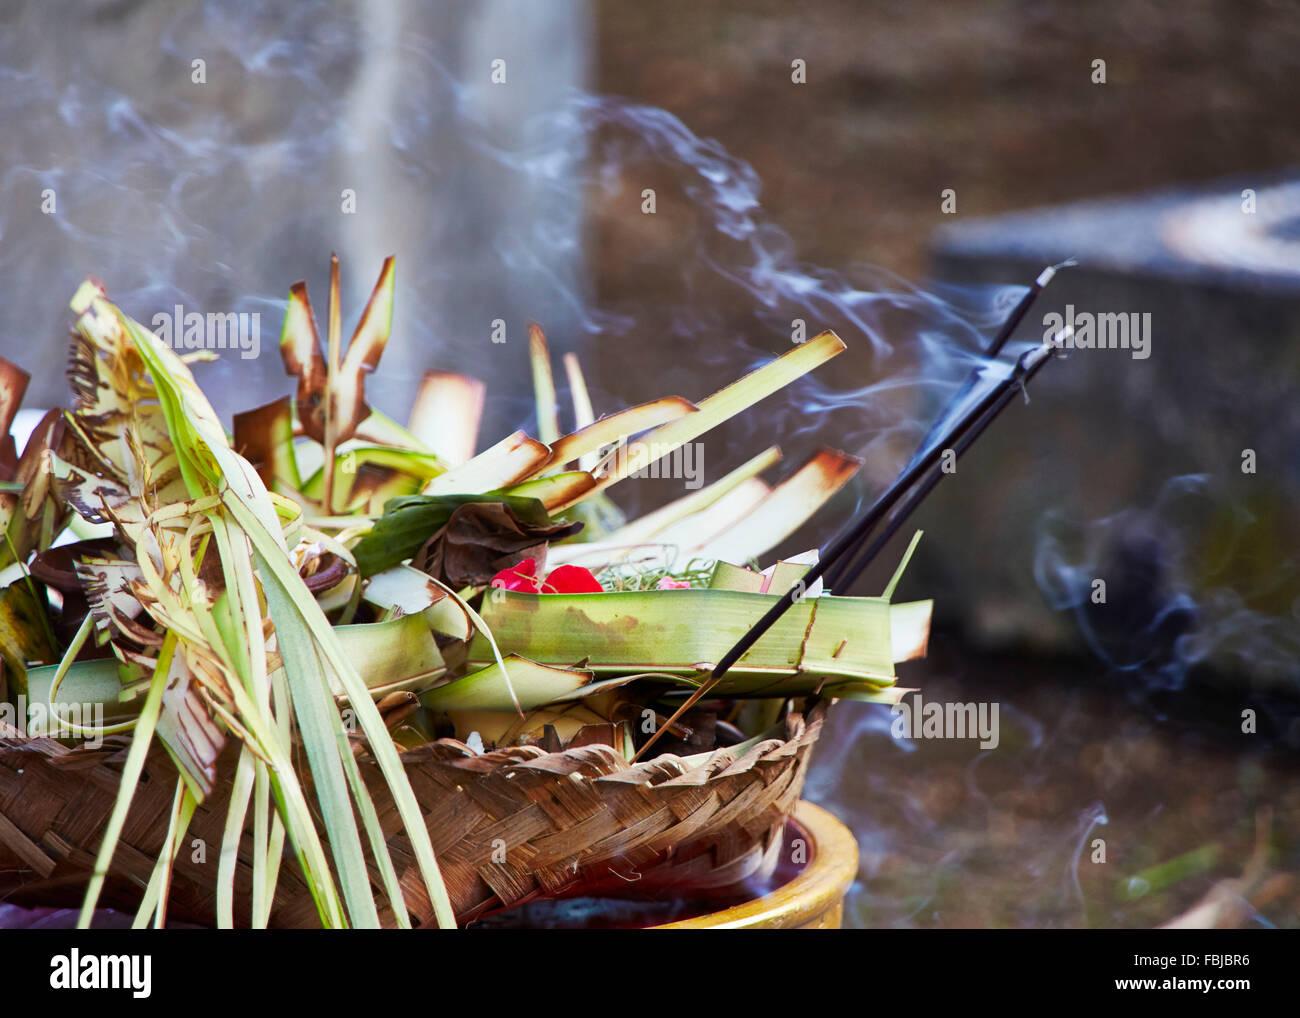 Ofertas, bowl, balineses, reportajes, bodas tradicionales, Bali, Indonesia, Asia Imagen De Stock